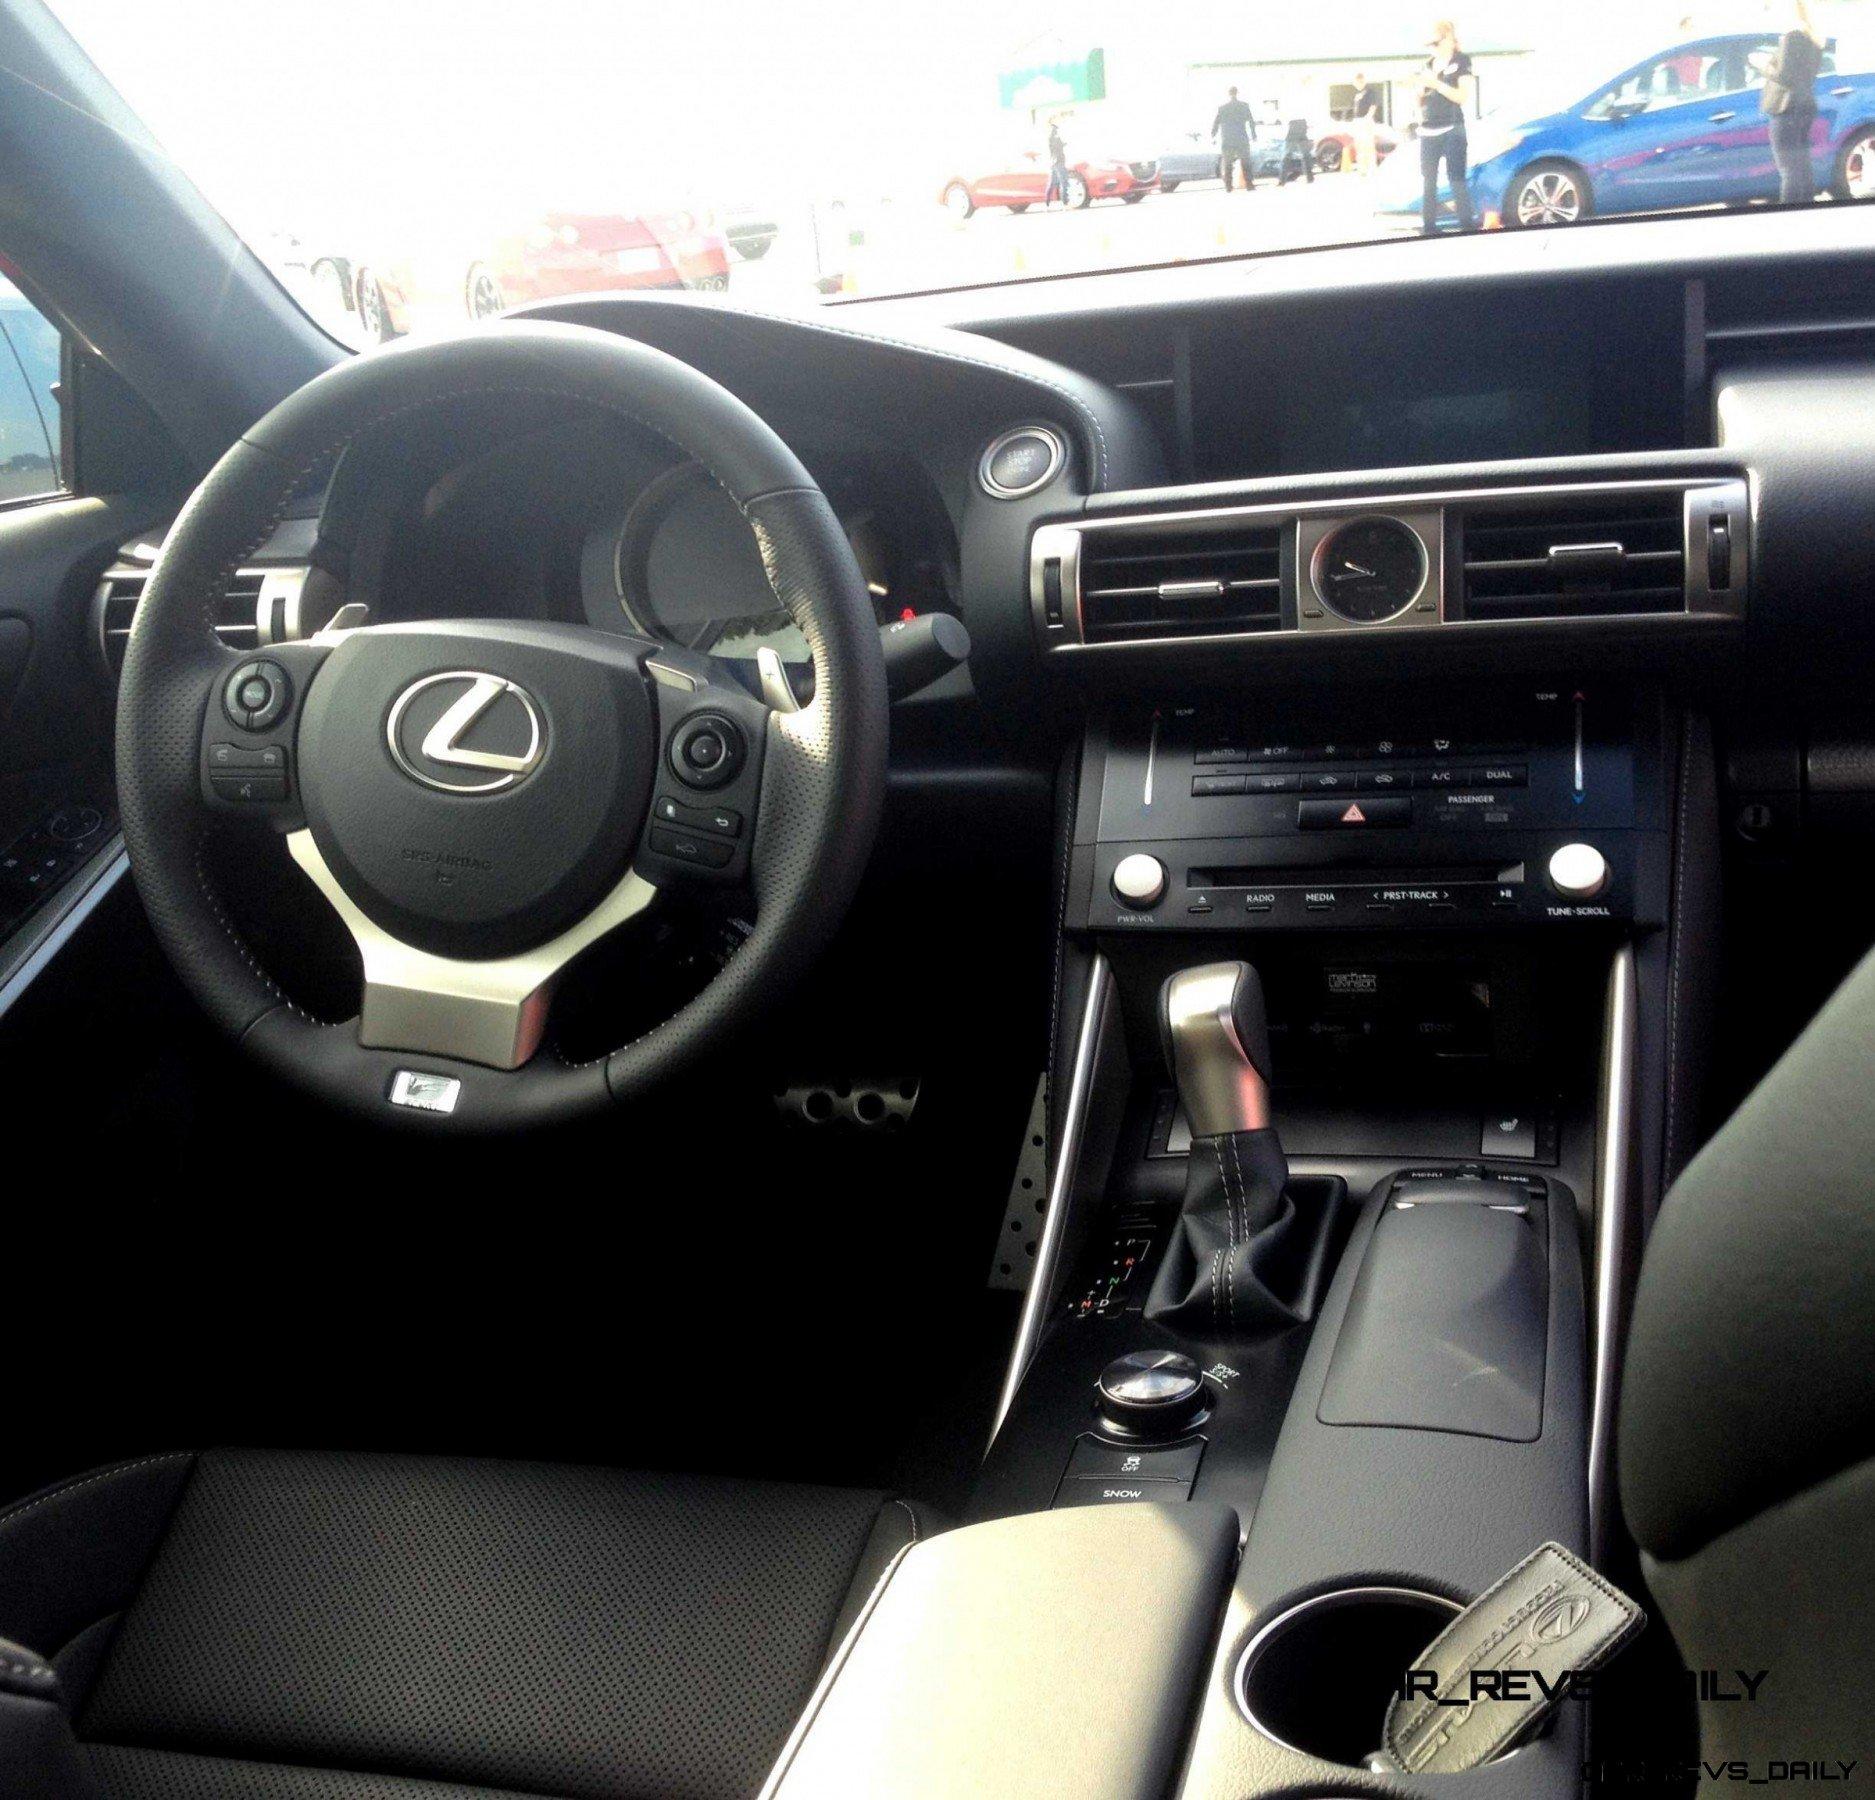 2014 Lexus IS350 AWD F Sport - First-Drive Photos8